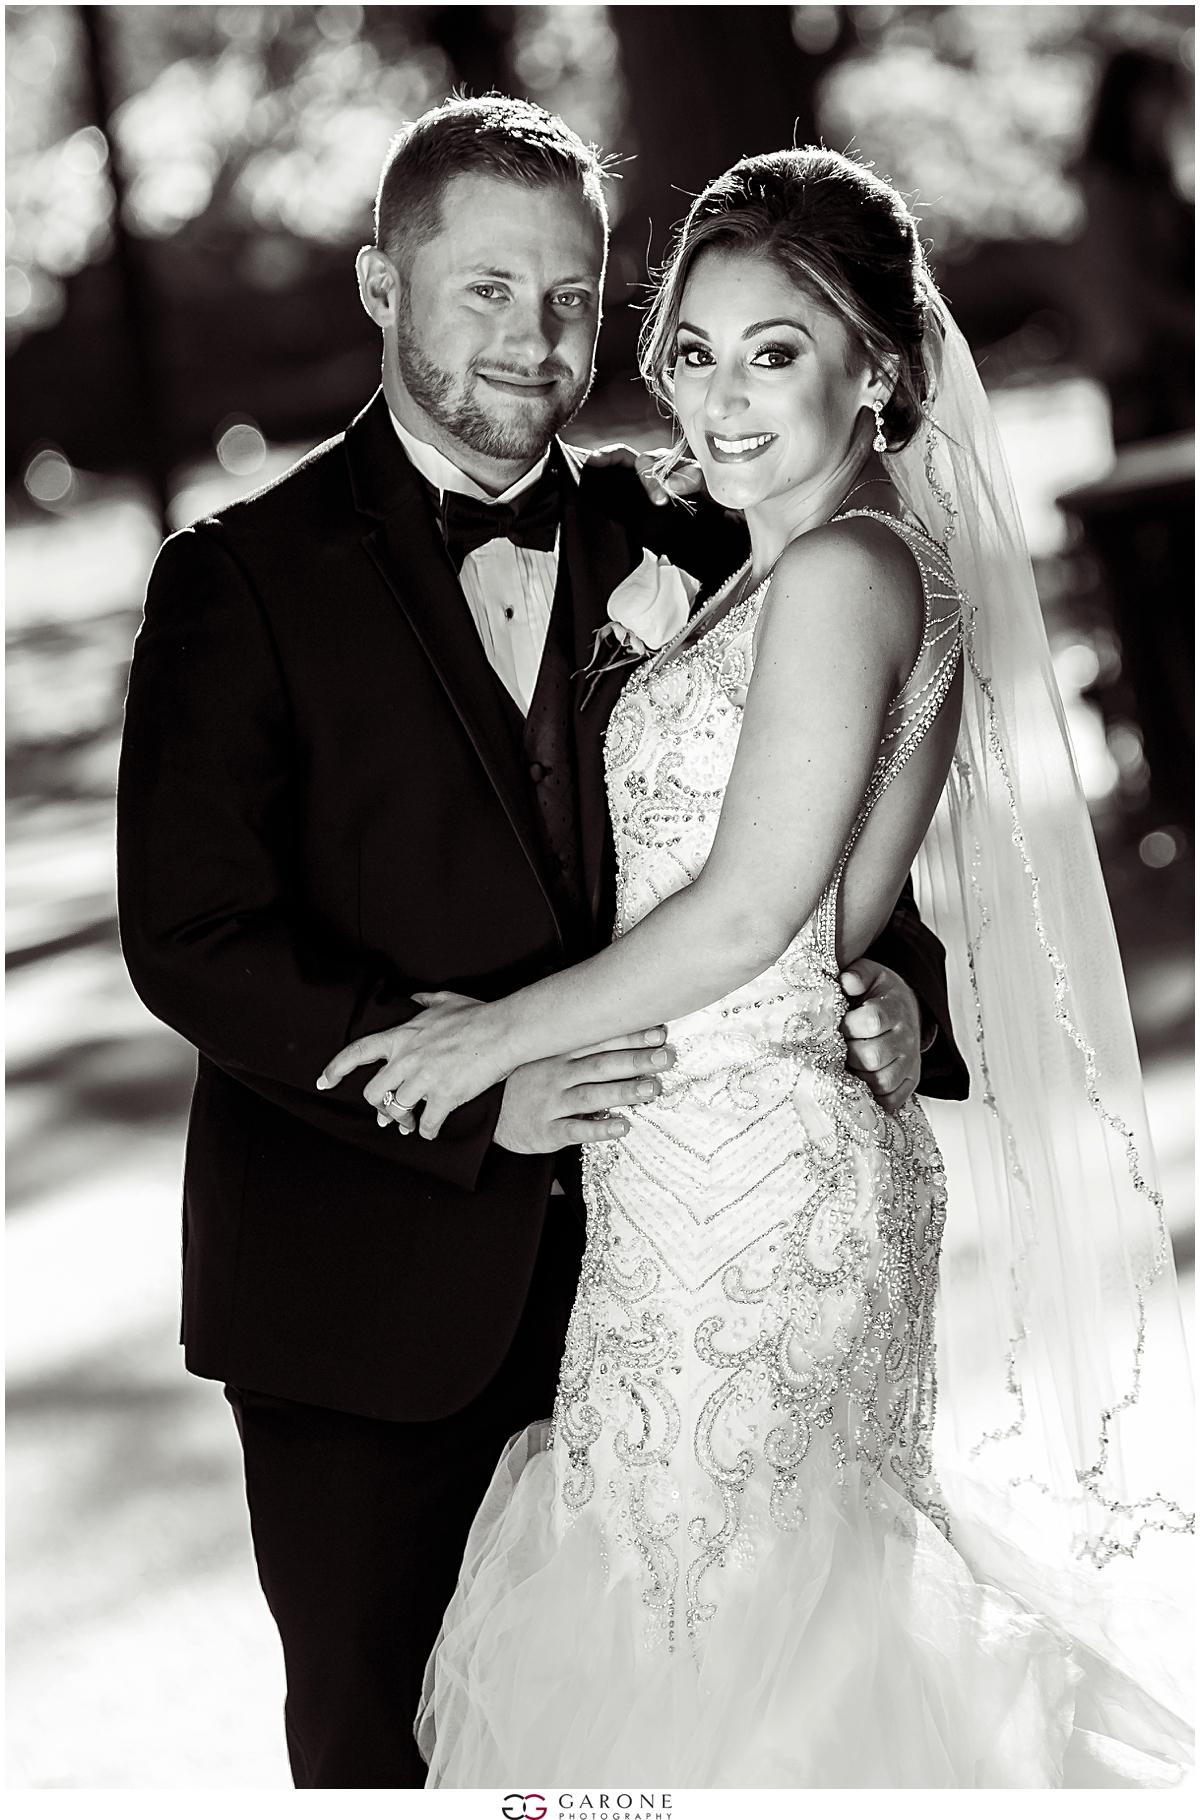 Erika_Eric_THe_State_Room_Boston_Wedding_Photography_Garone_Photography_Boston_Wedding_Photography_0001.jpg